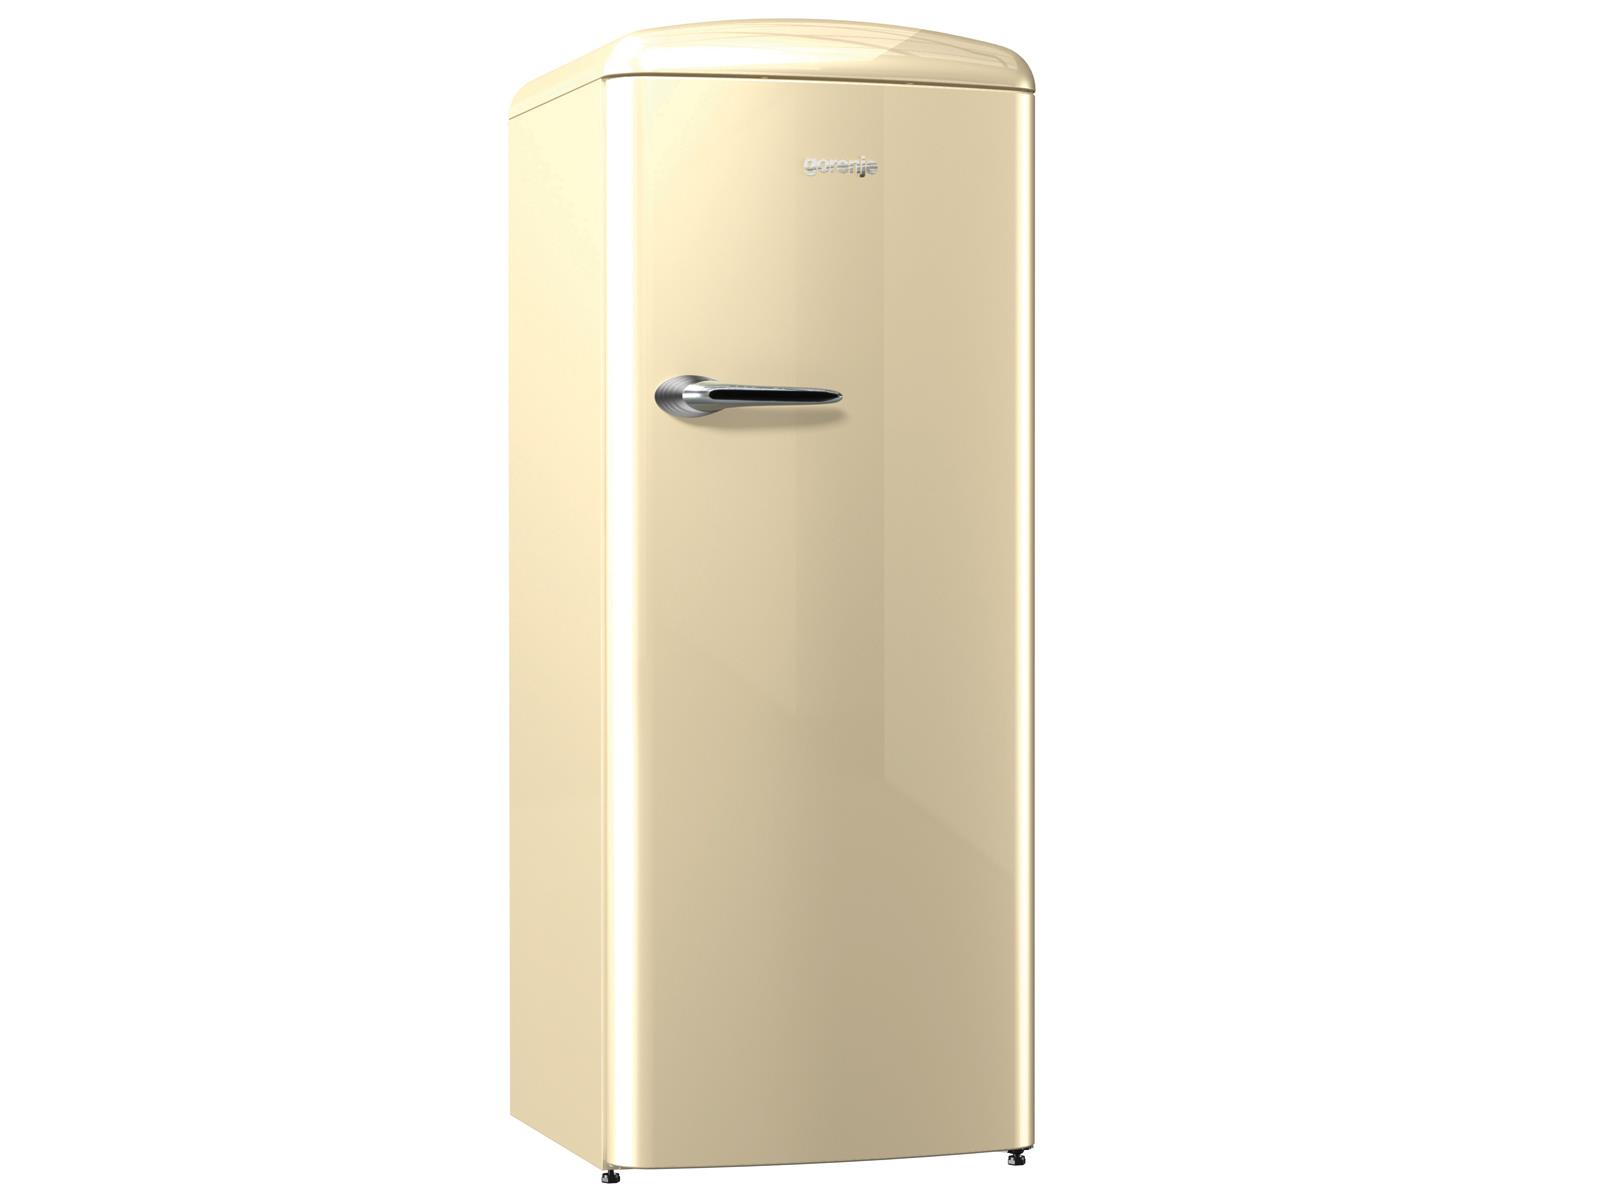 Retro Kühlschrank Linksanschlag : Stand kühlschrank bomann vs a stand kühlschrank cm breit